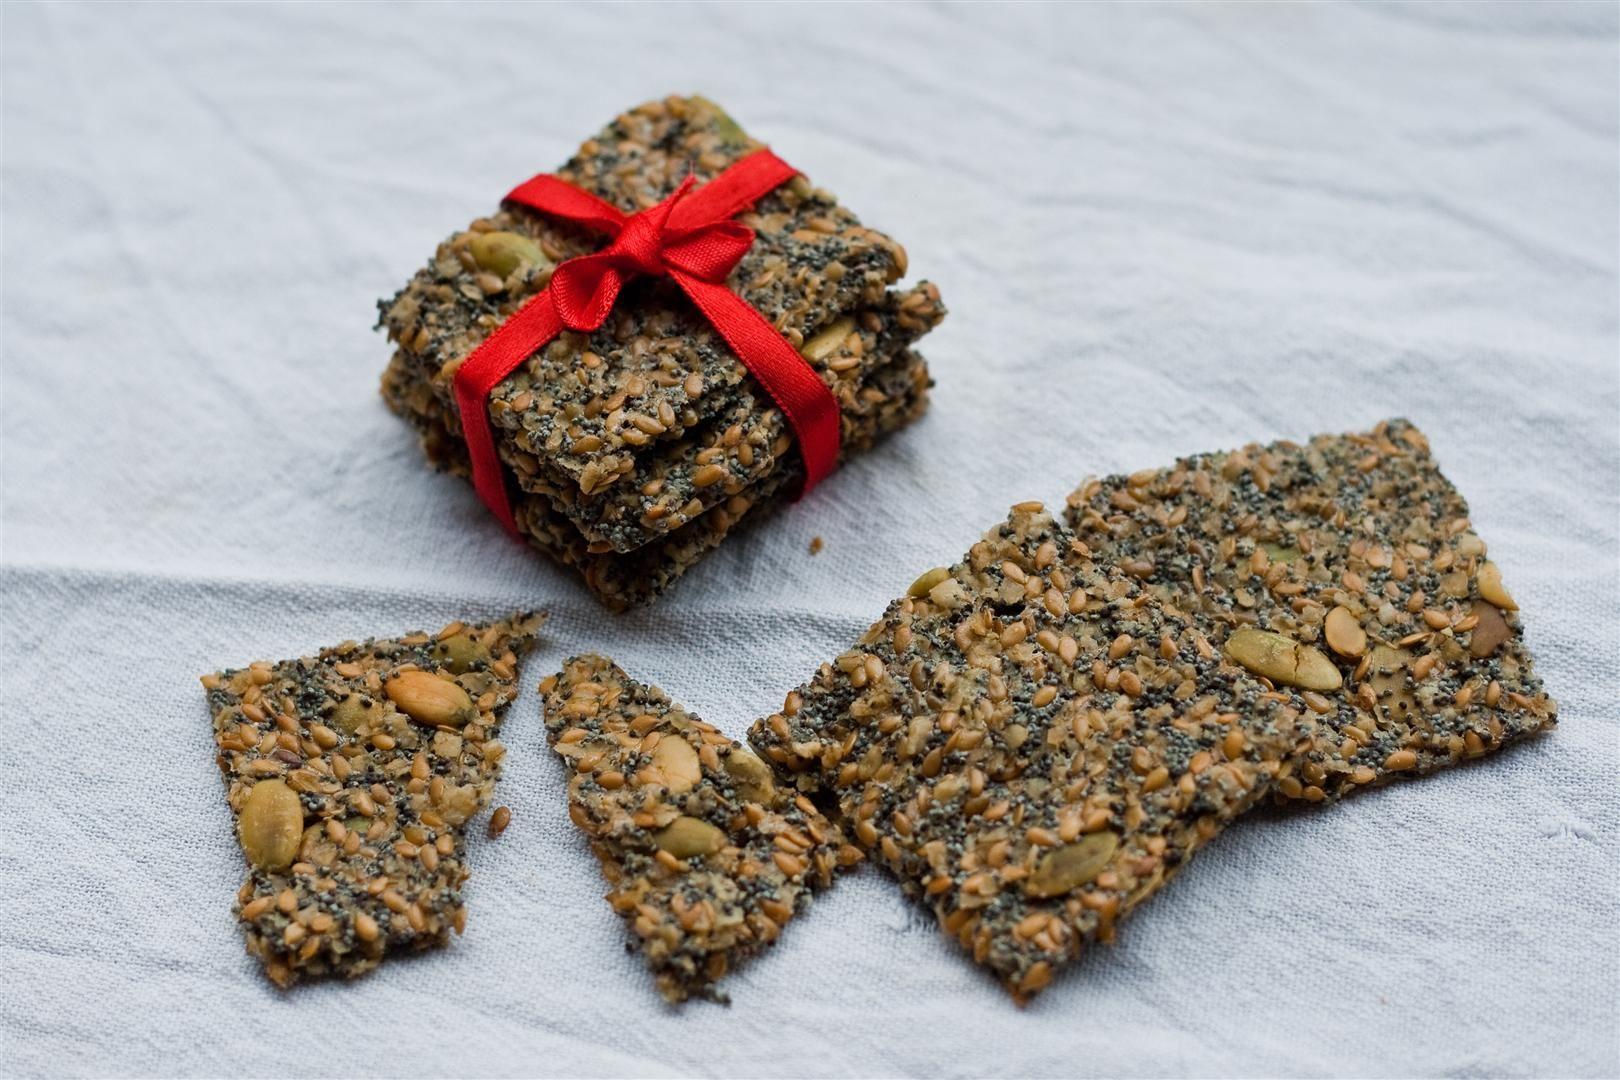 Knäckebröd (soaked gluten free seed cracker)